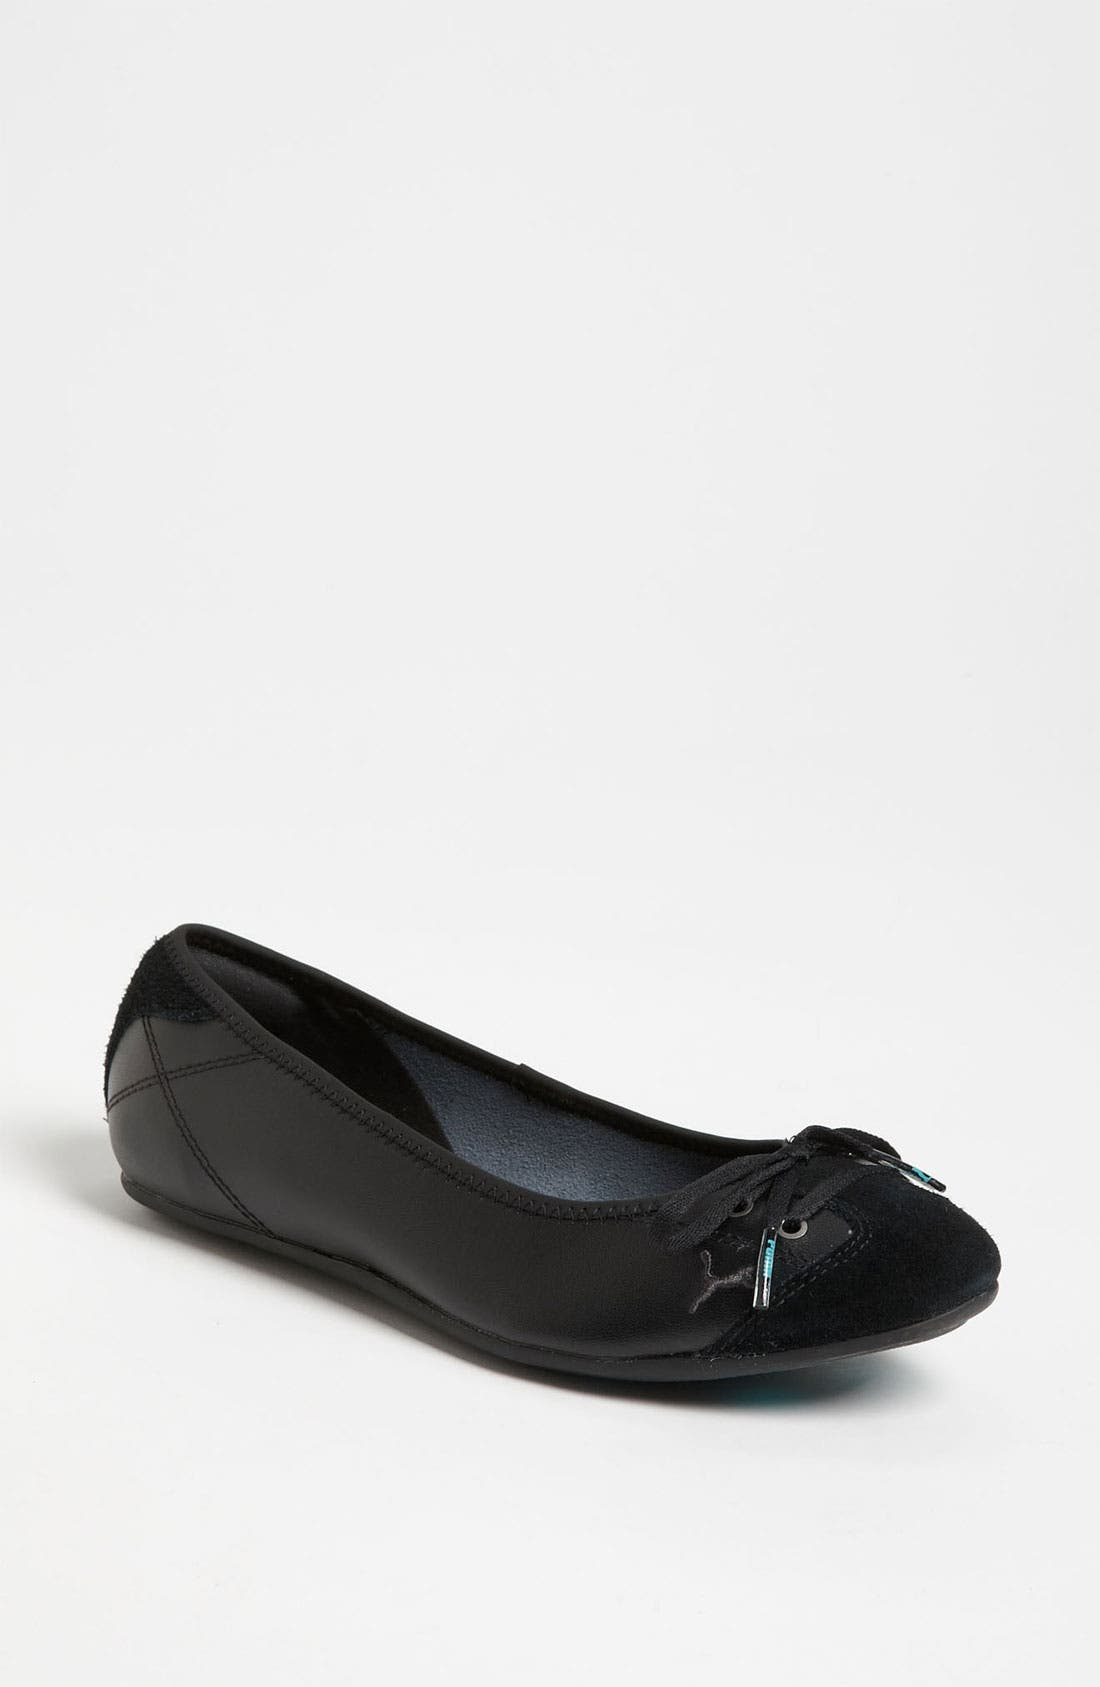 Main Image - PUMA 'Lily' Ballet Flat